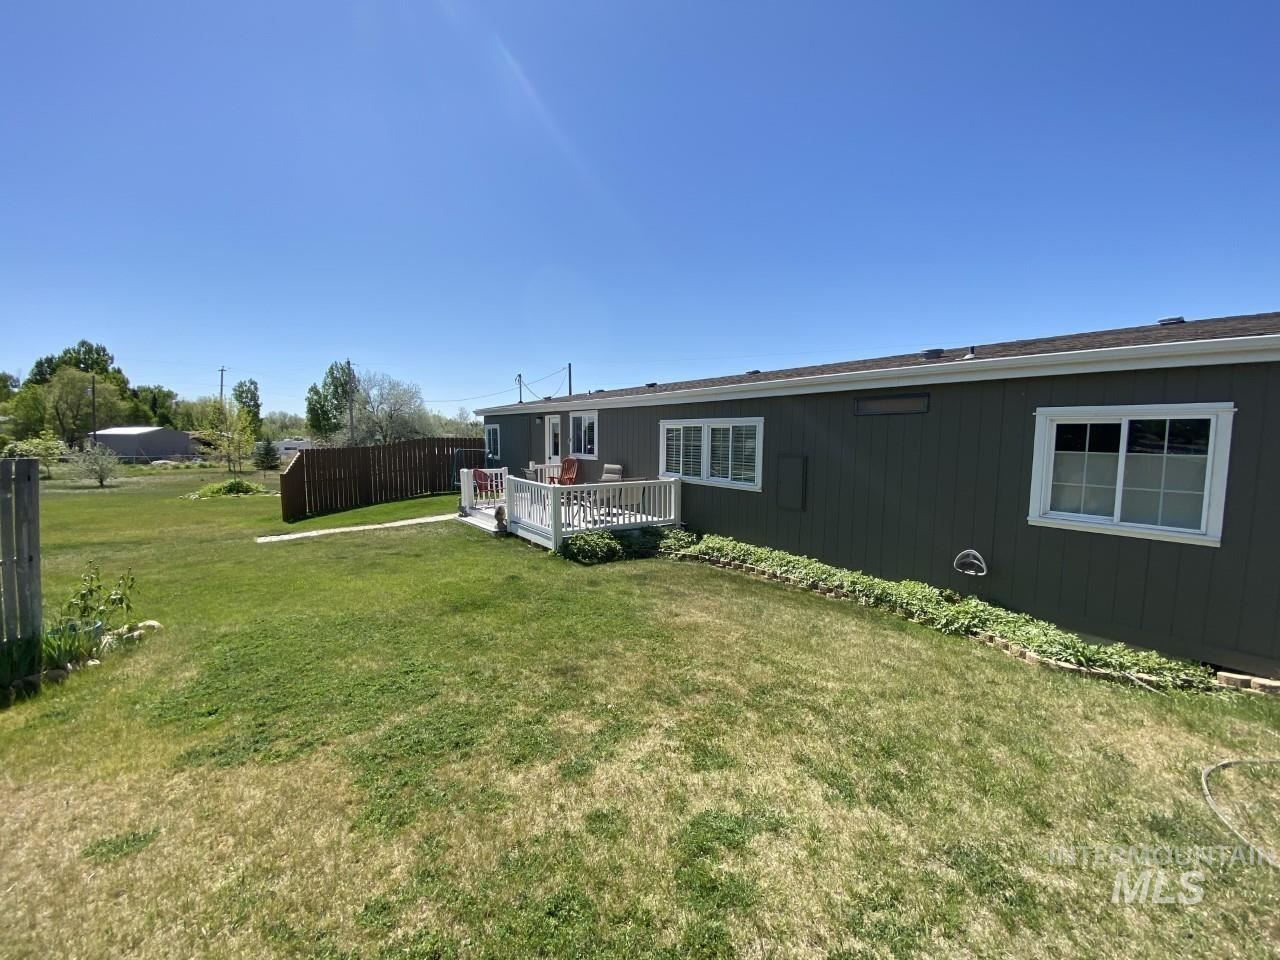 Photo of 554 N Waucanza St, Dietrich, ID 83324 (MLS # 98806414)